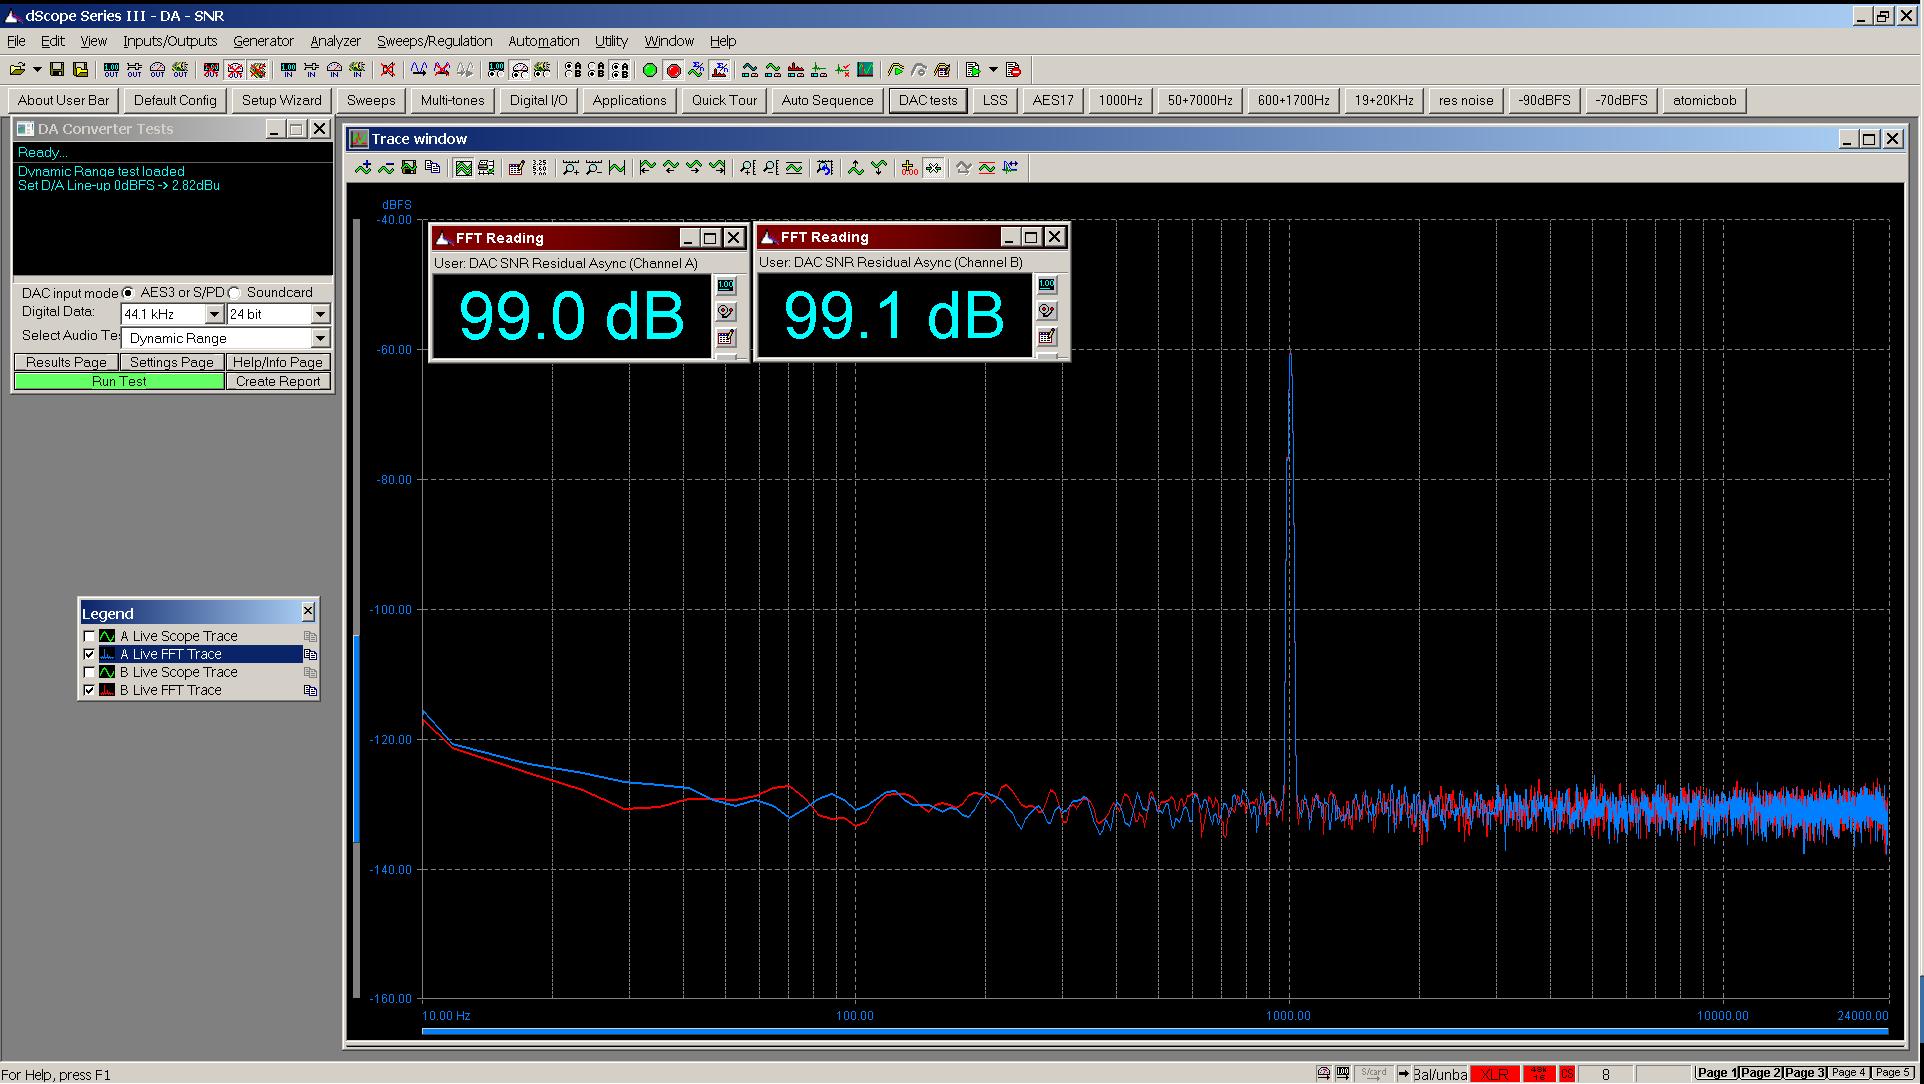 20181227-14 convert2 Bal dynamic range - AES.PNG